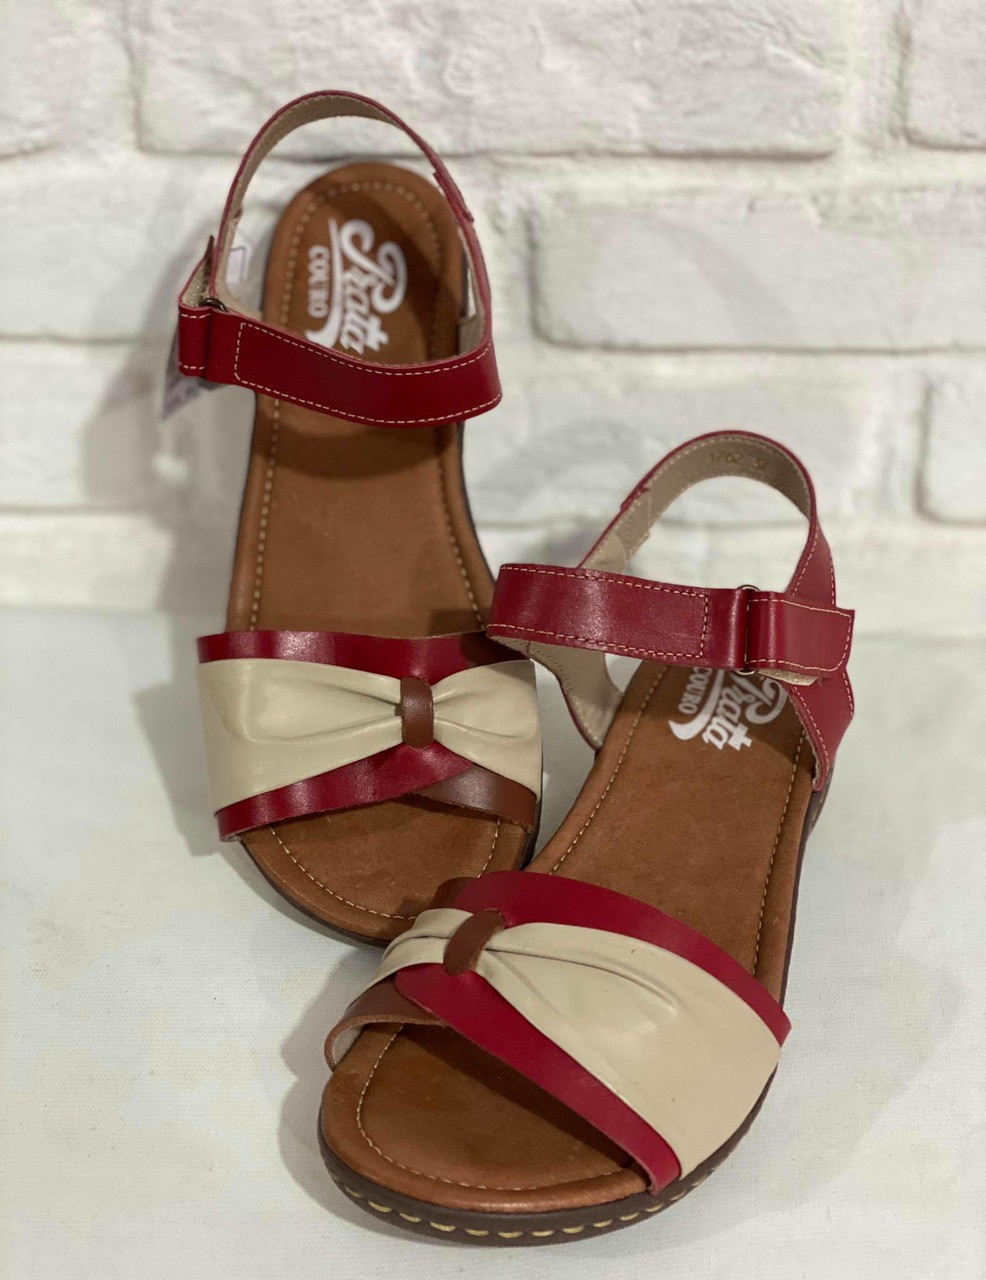 Sandália  Feminina 1010337 Vermelha/Marfim